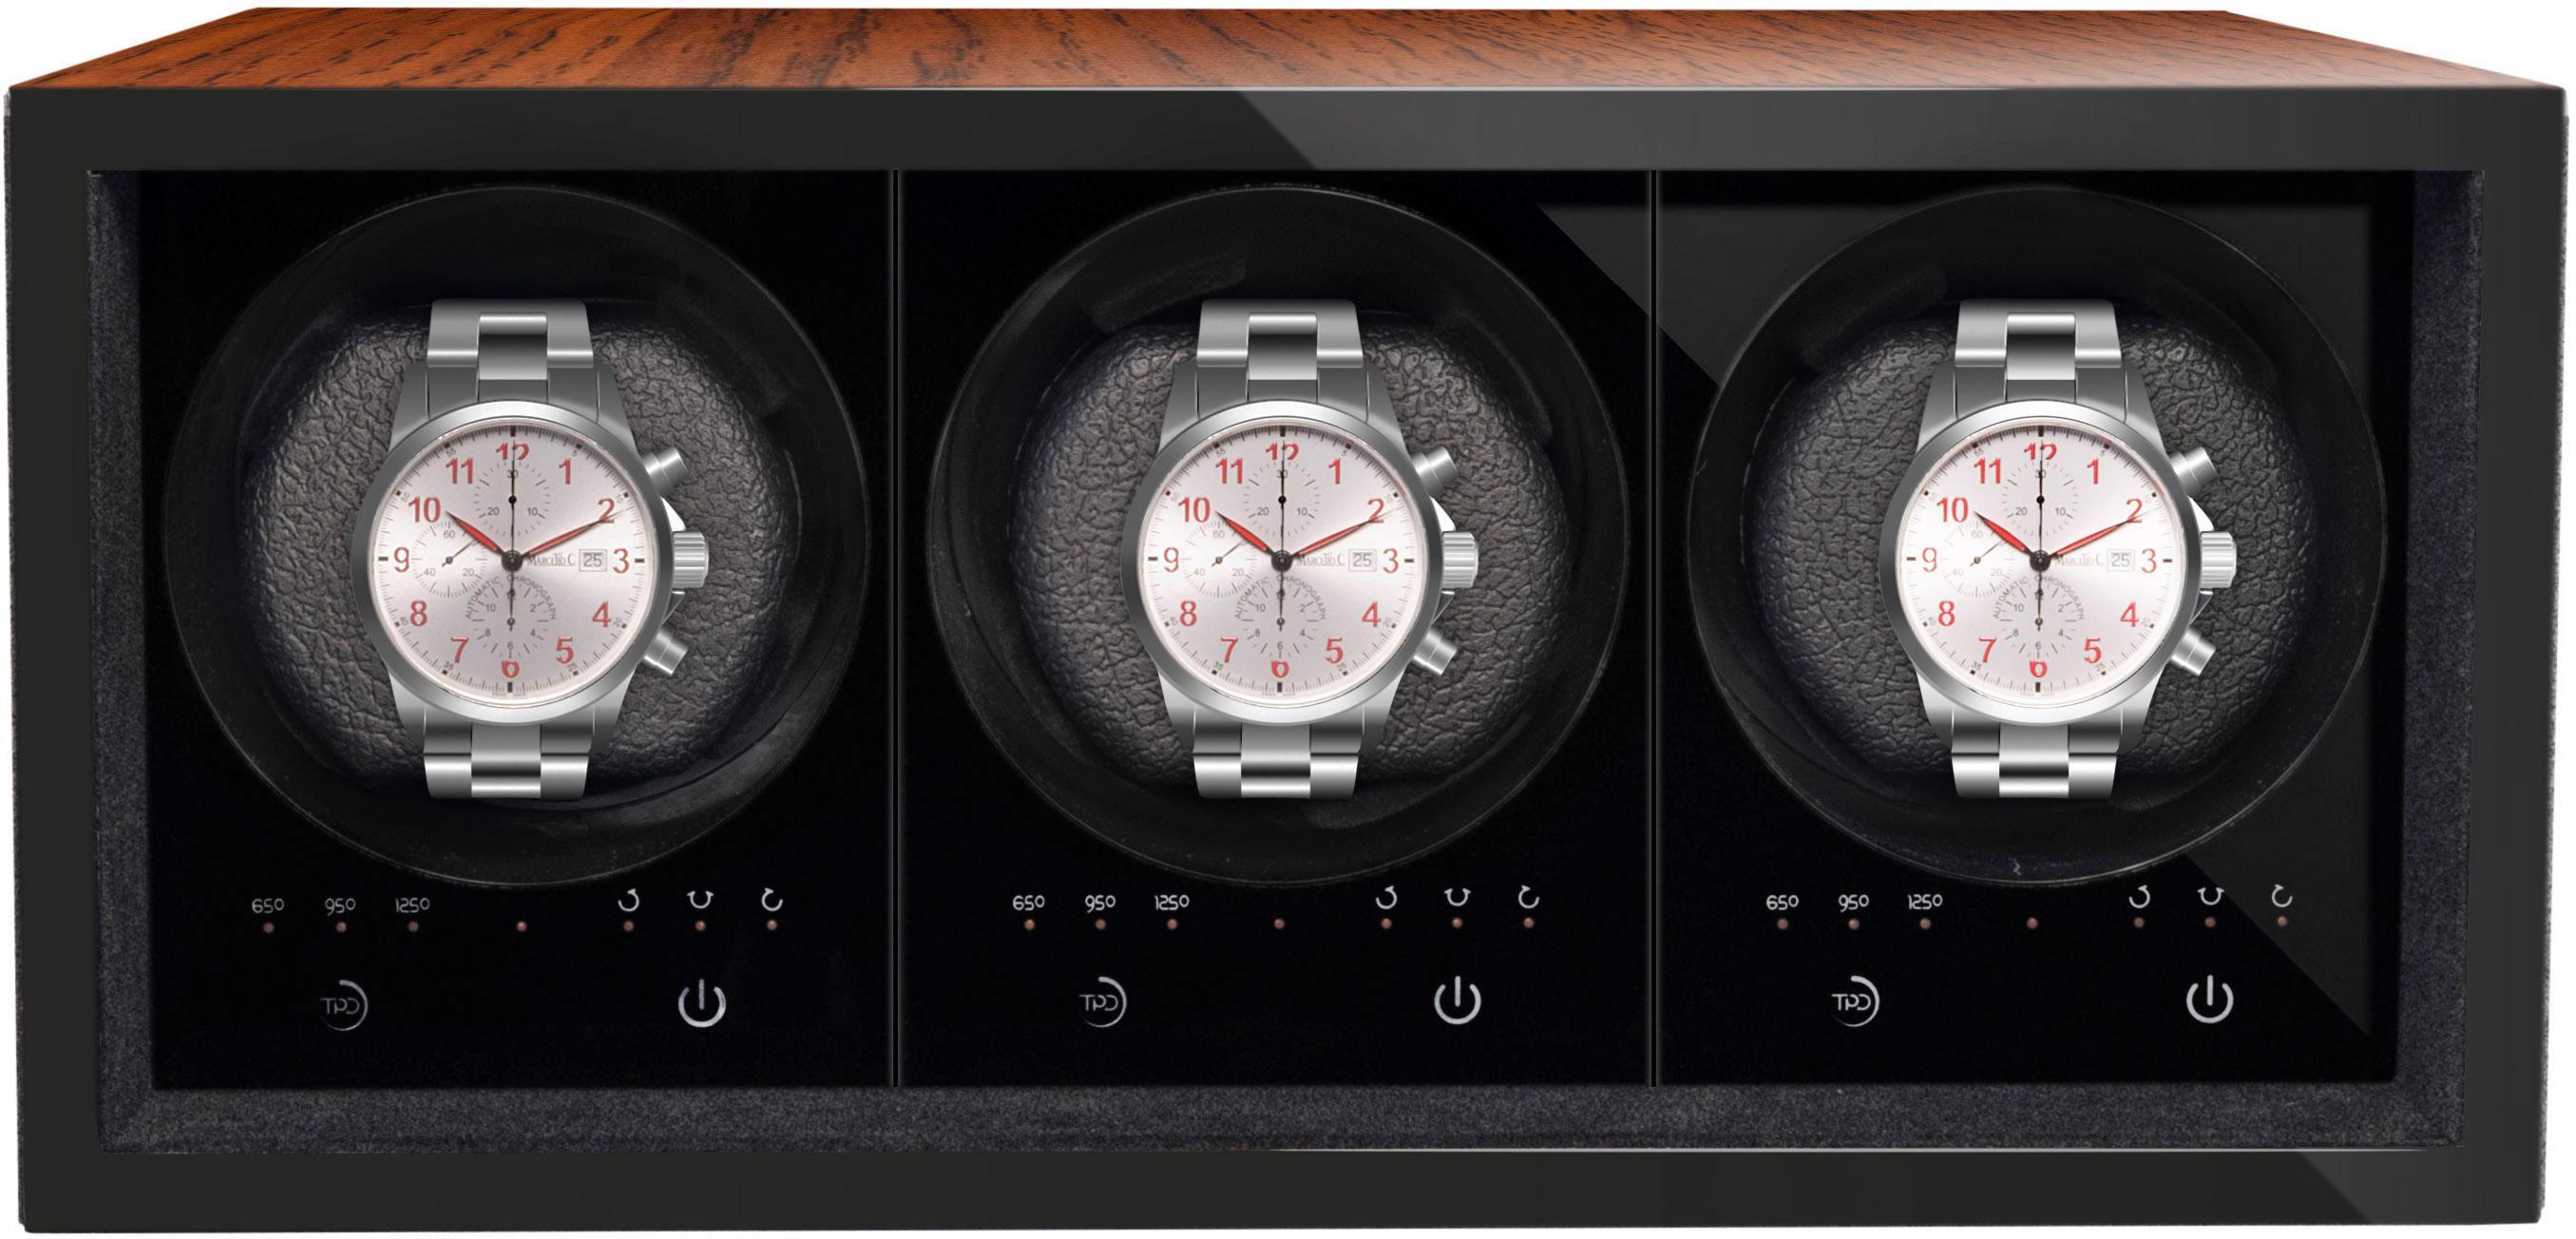 Boxy Uhrenbeweger »Boxy BLDC Safe 03, 309263« | Uhren > Uhrenbeweger | Boxy